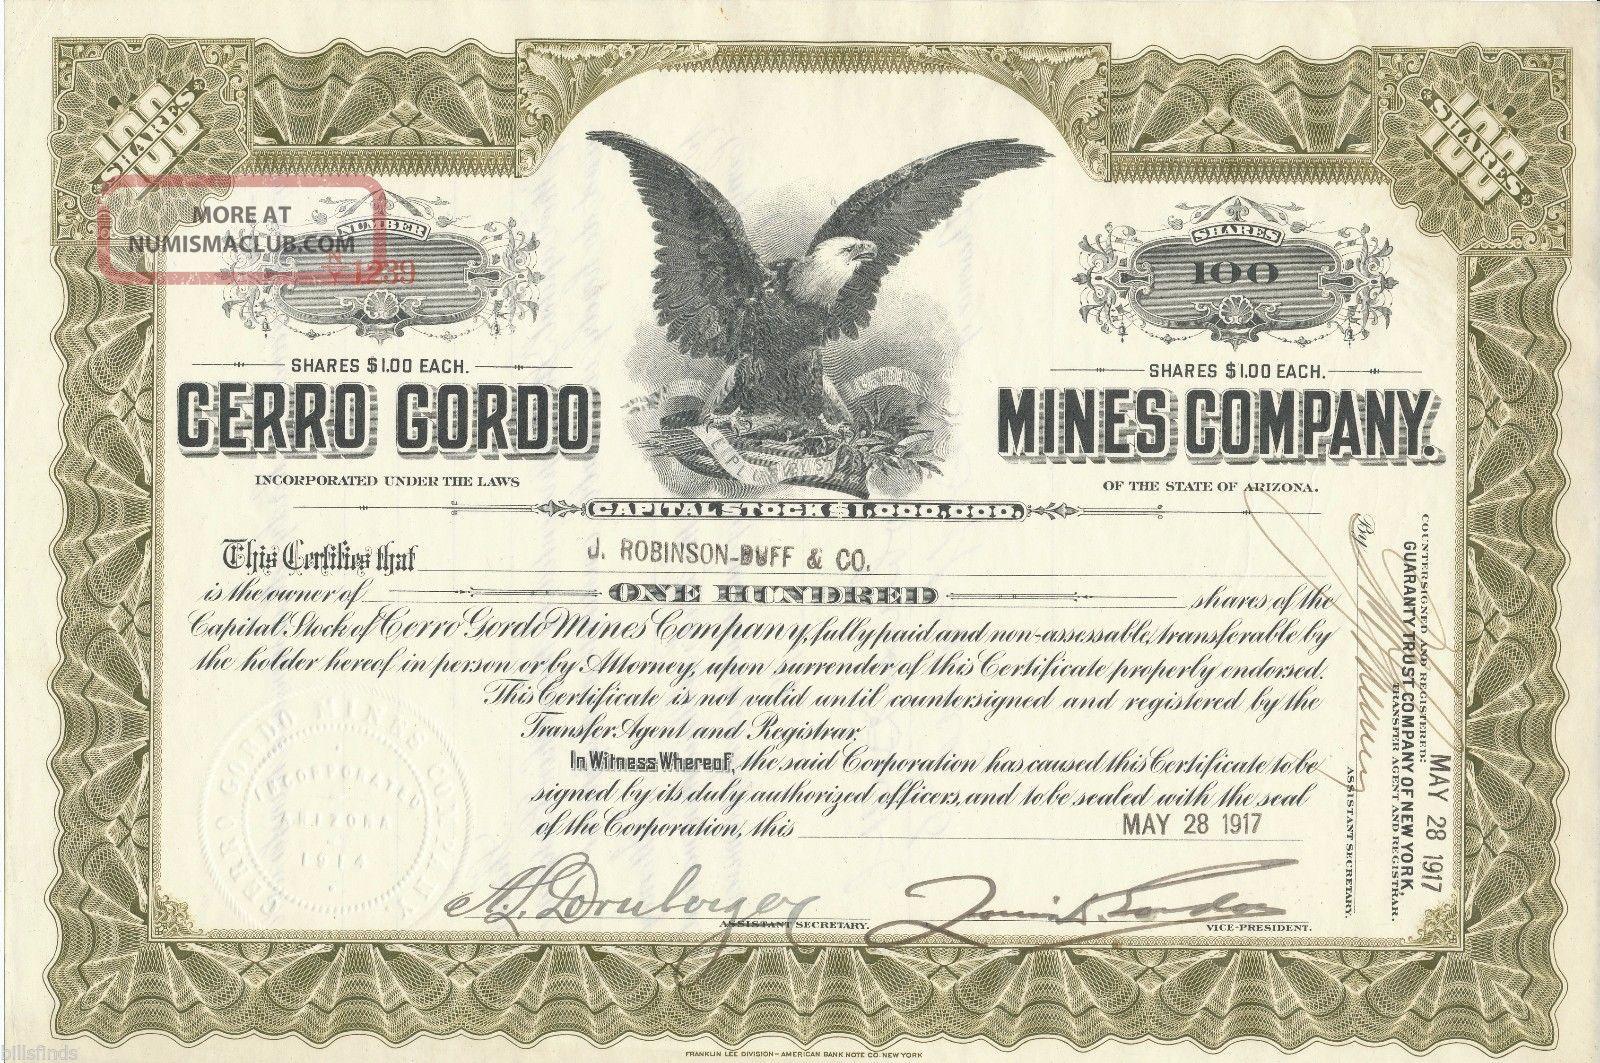 1917 Cerro Gordo Mines Company Stock Certificate Inyo California Silver Mining Stocks & Bonds, Scripophily photo